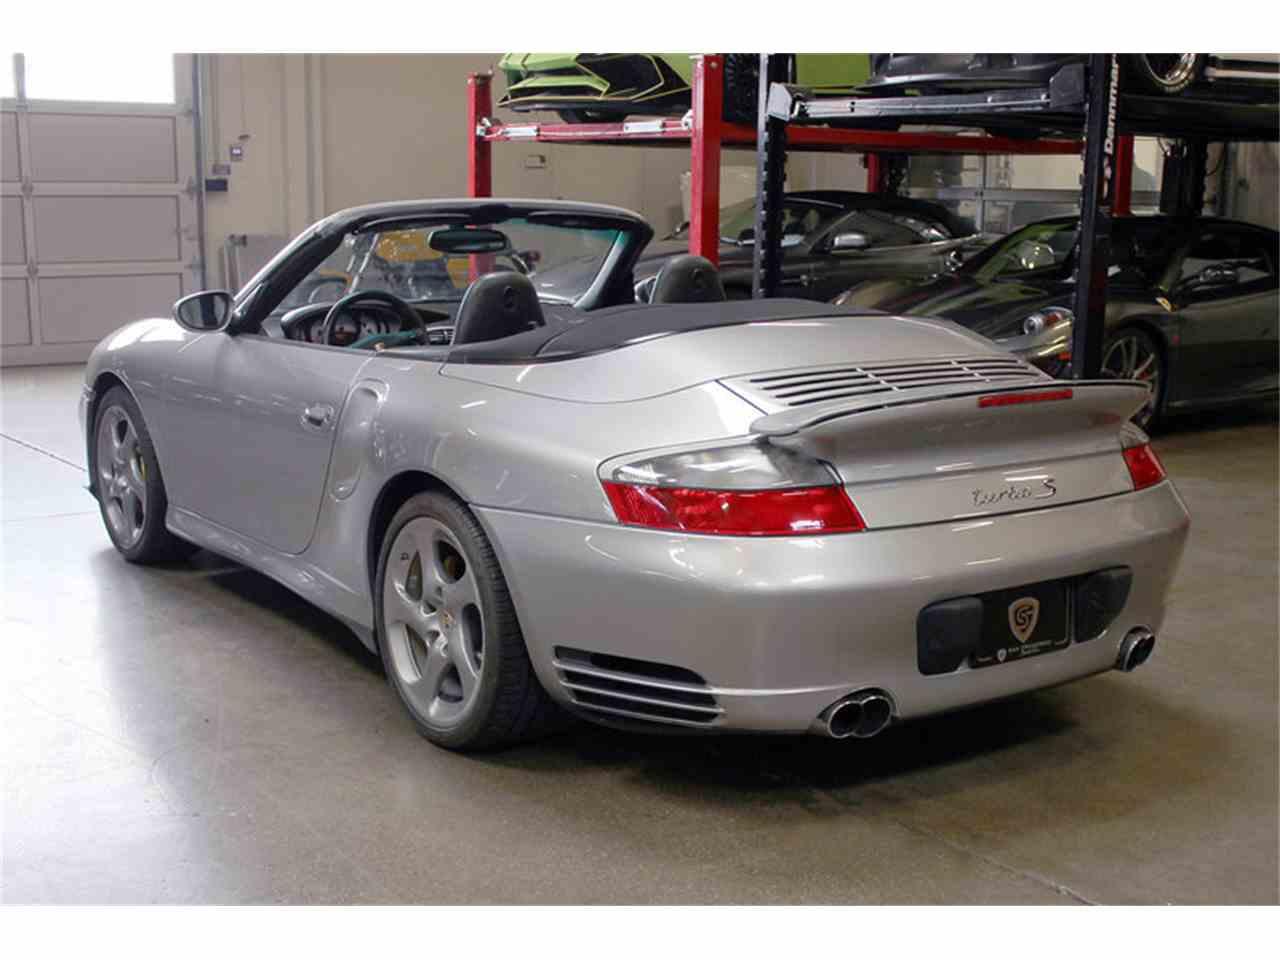 2005 porsche 911 turbo s cabriolet for sale cc 1070591. Black Bedroom Furniture Sets. Home Design Ideas